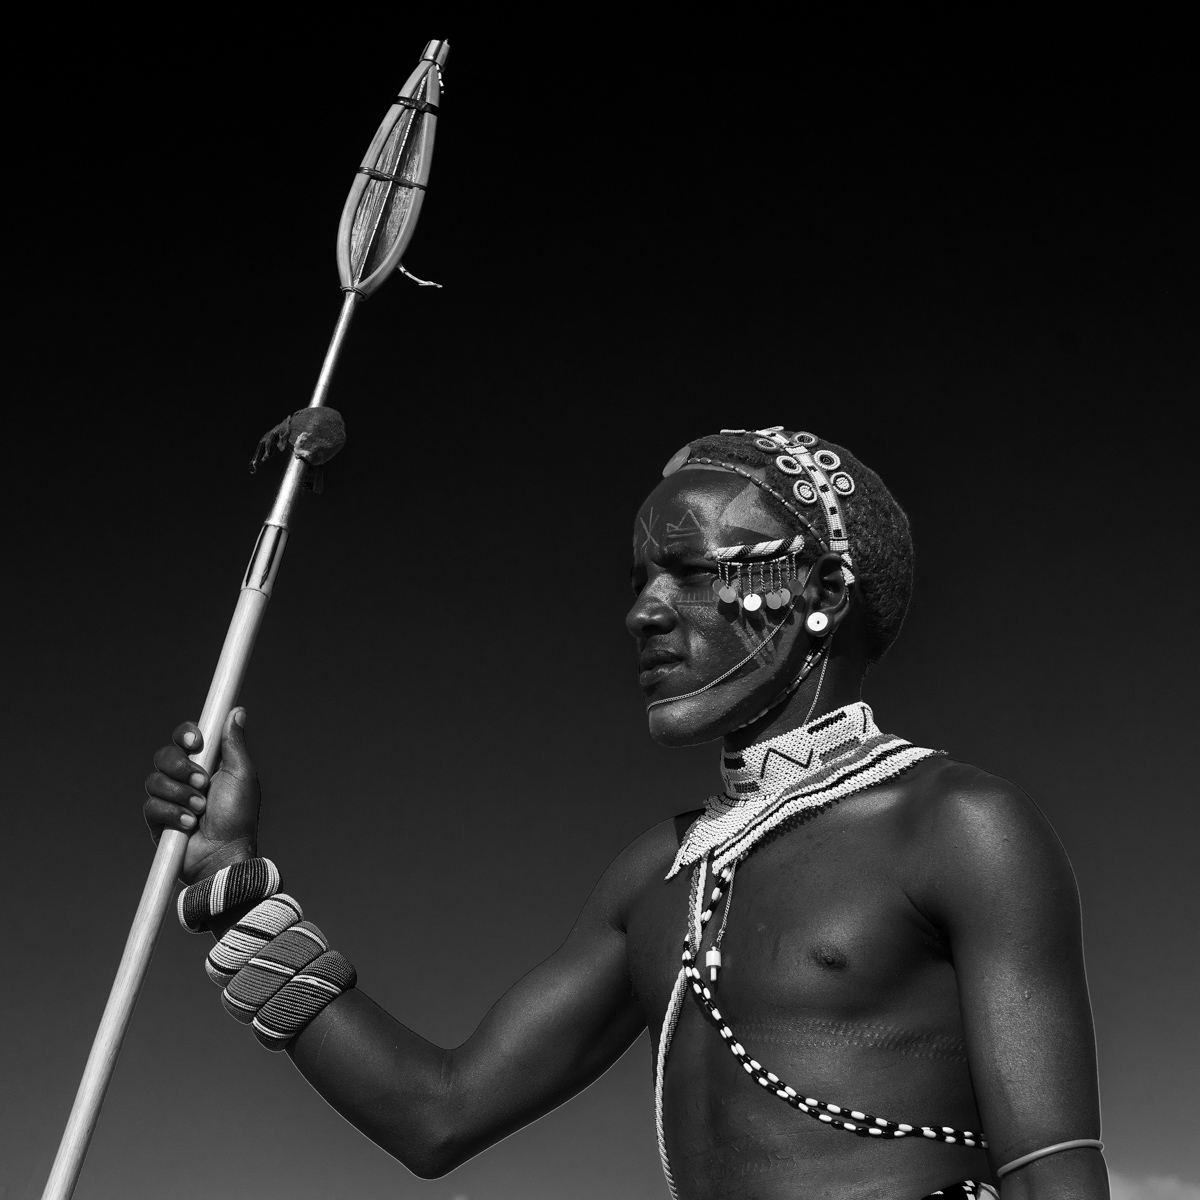 #3. Warrior standing guard. 80x80cm